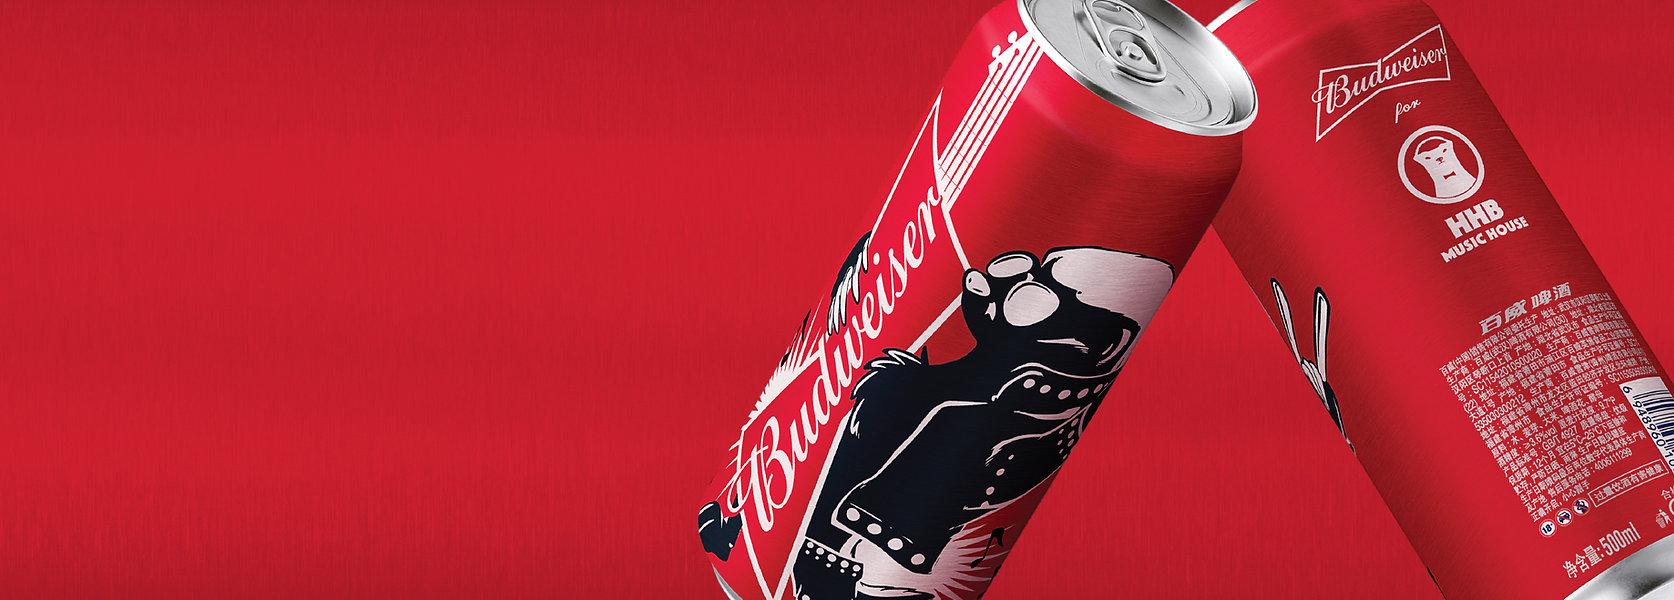 ADDLESS DESIGN STUDIO - Budweiser HHB